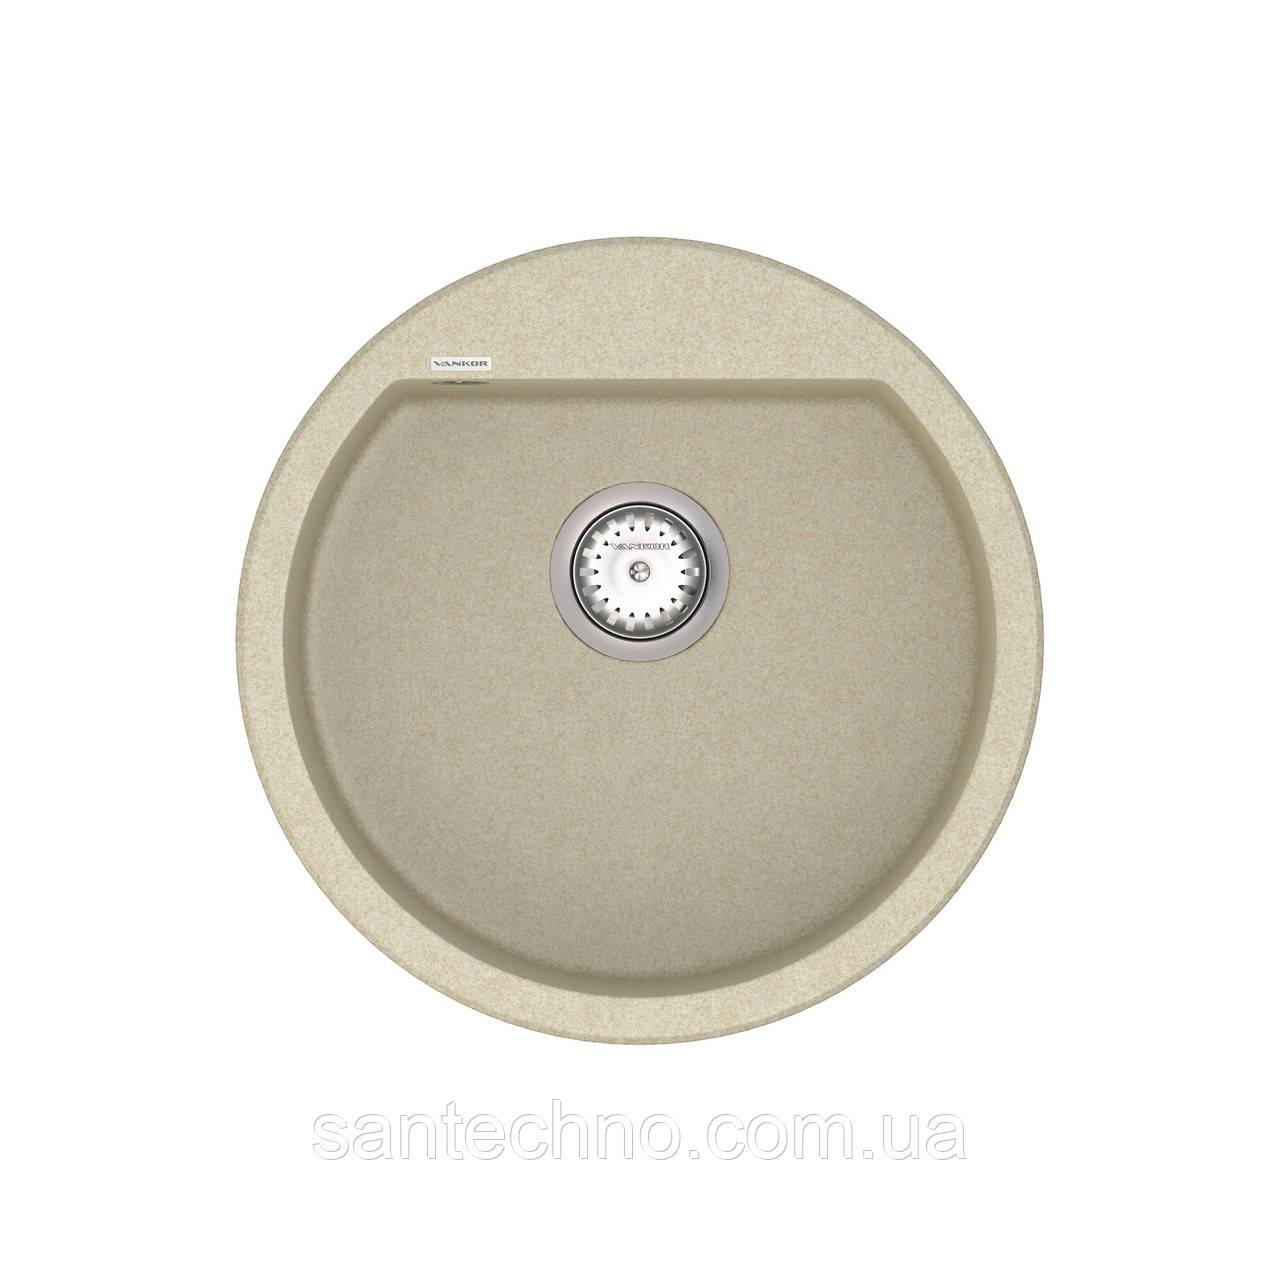 Кухонная круглая врезная мойка VANKOR Tera TMR 01.50 Beige + сифон VANKOR